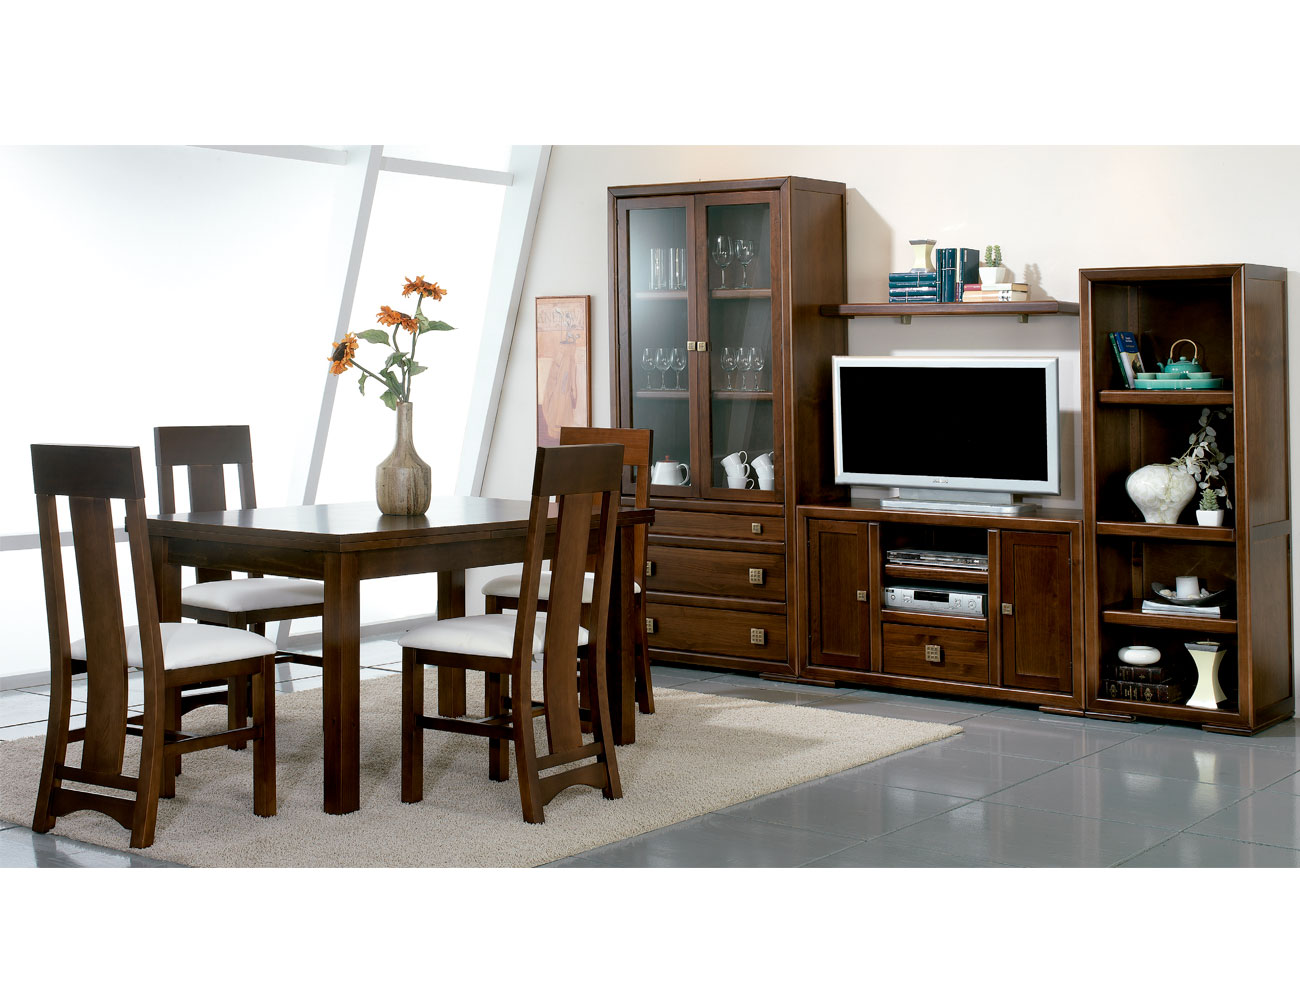 Composicion12 mueble salon comedor mesa silla1